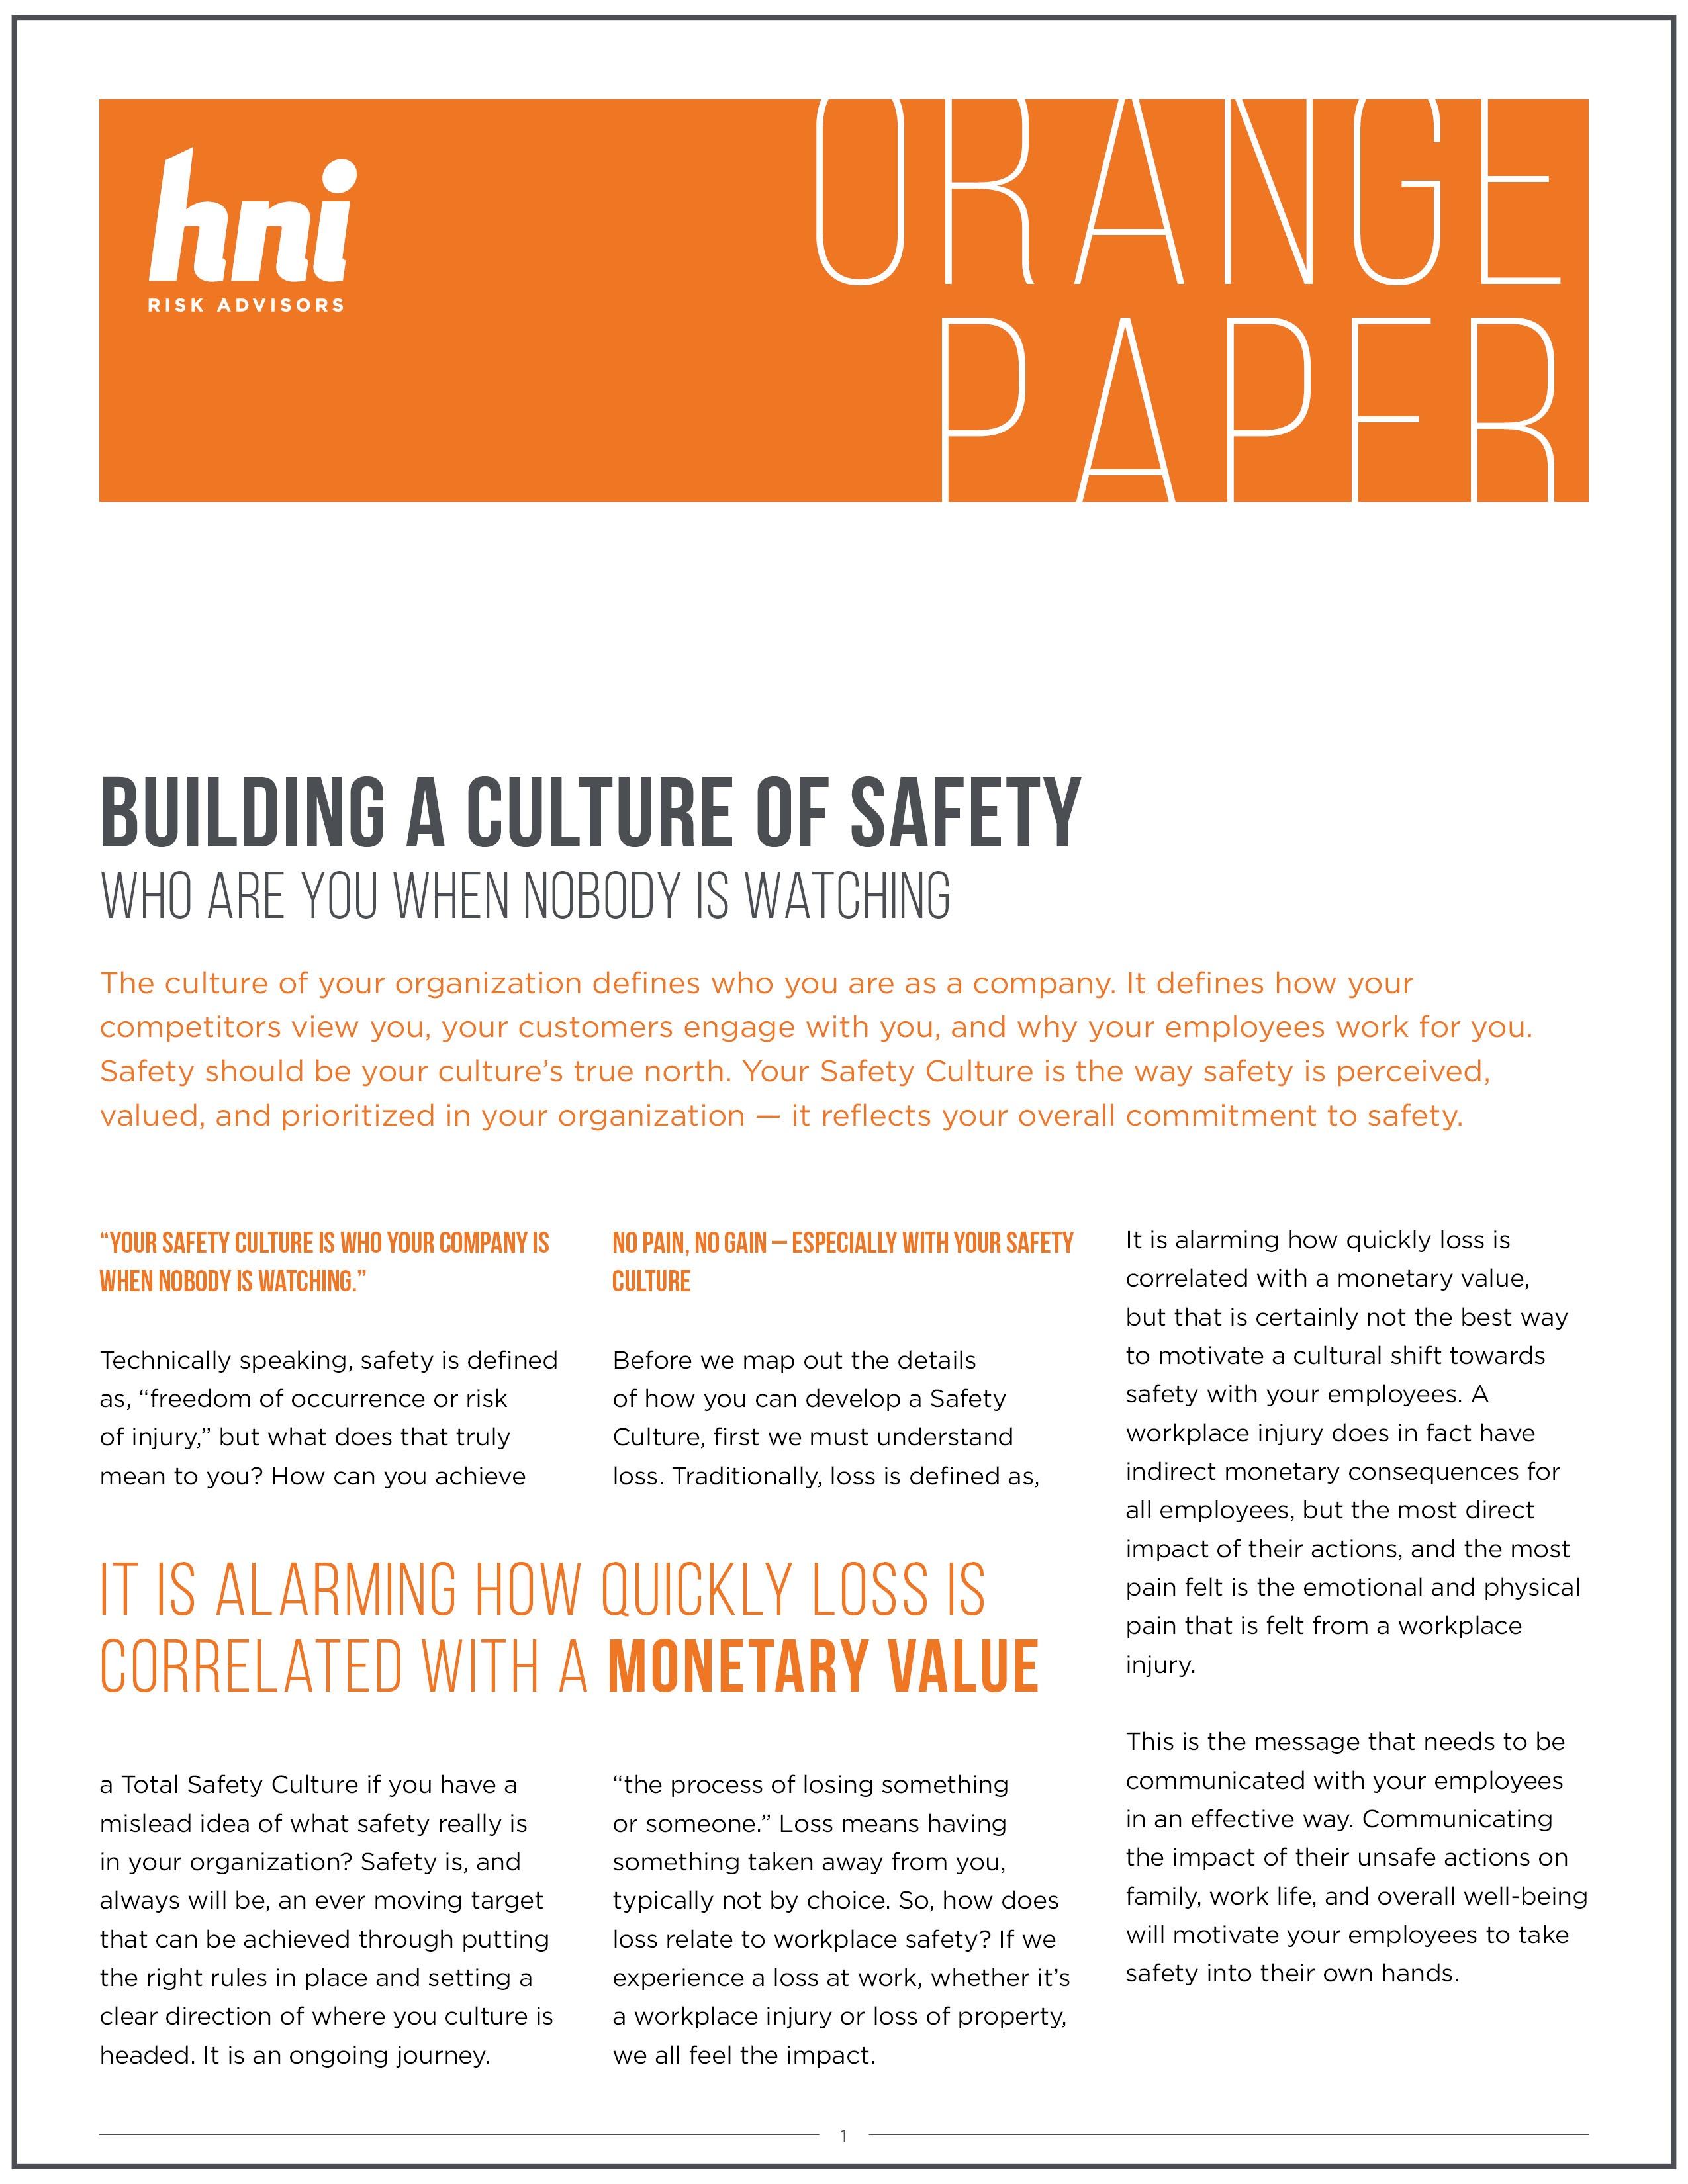 HNI_Orange Paper_Building A Culture of Safety.jpg